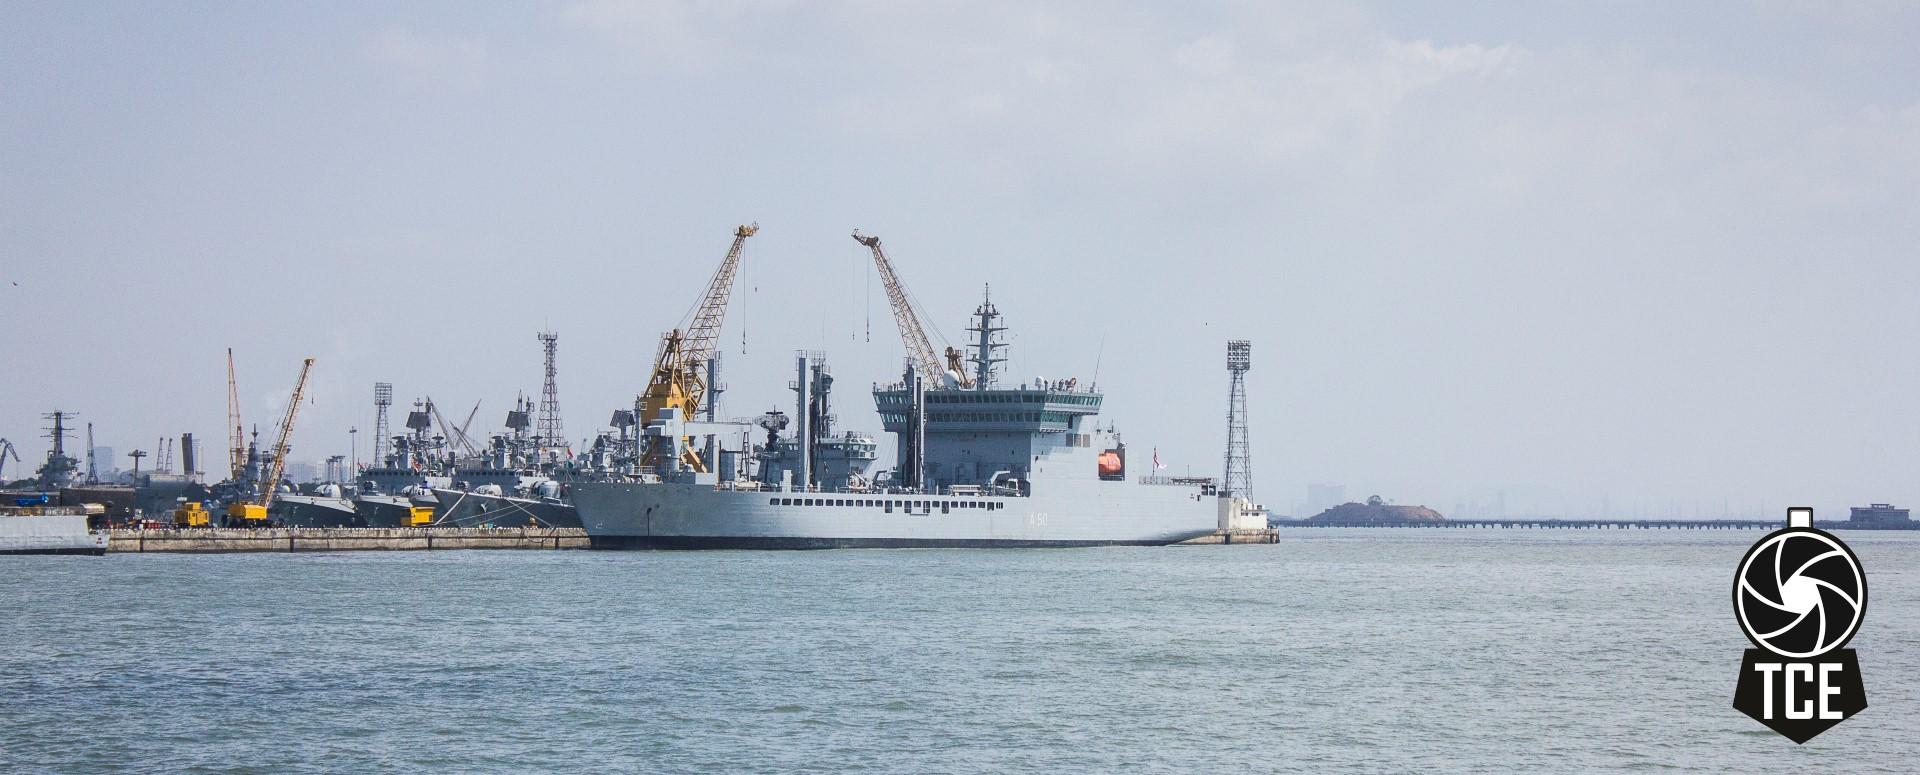 A Naval Ship